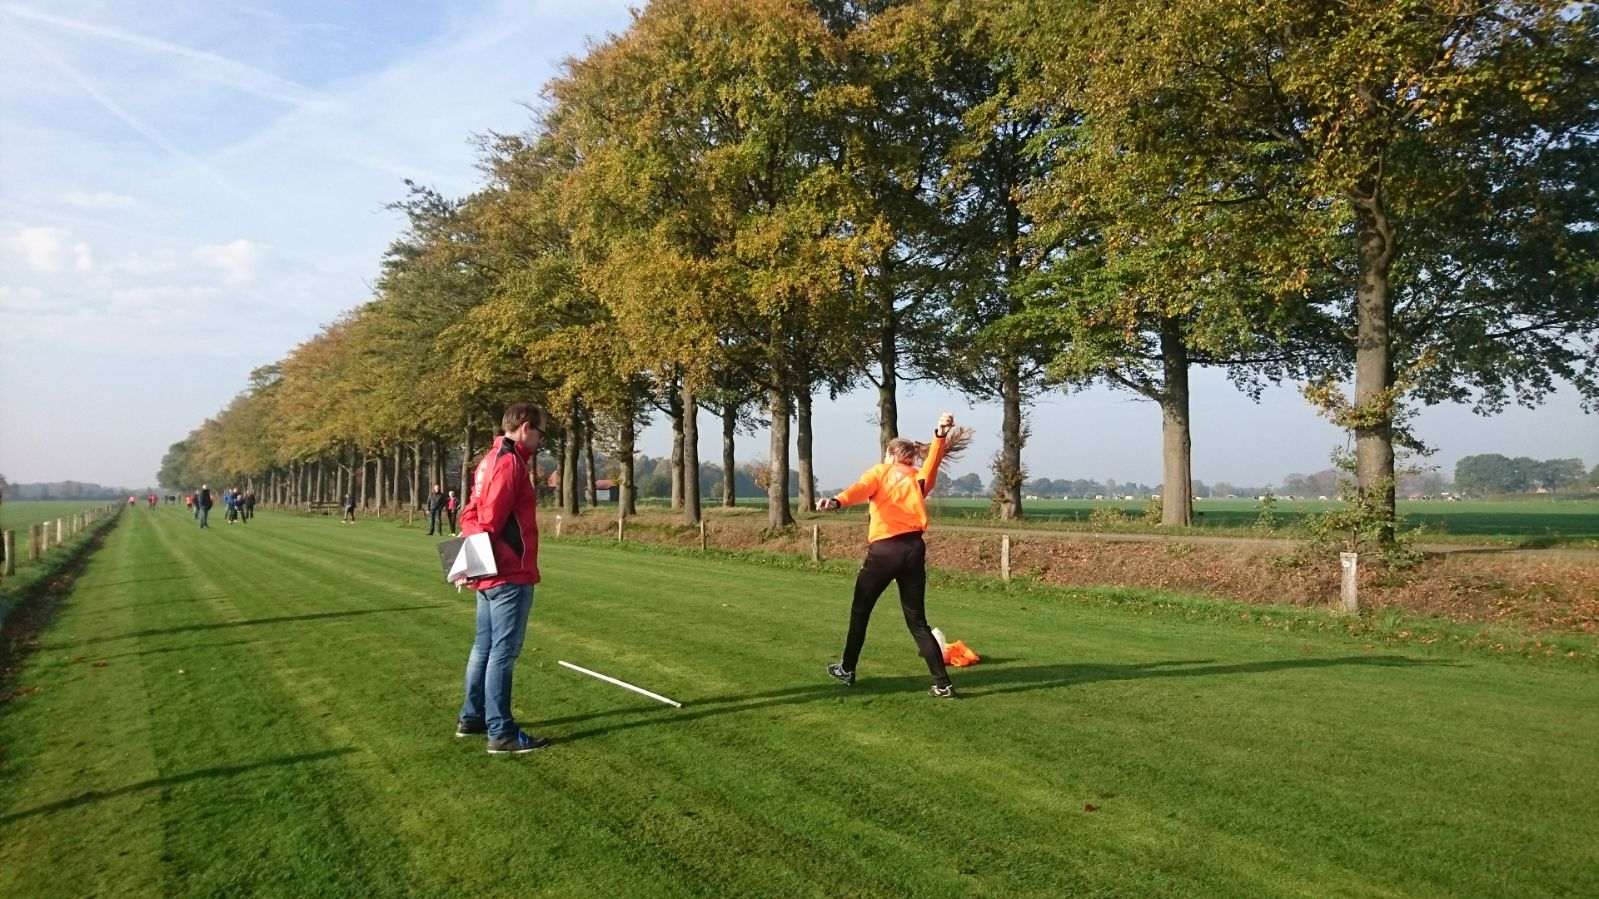 Indeling Grolsch Champions Tour veld & zetten 2019-2020